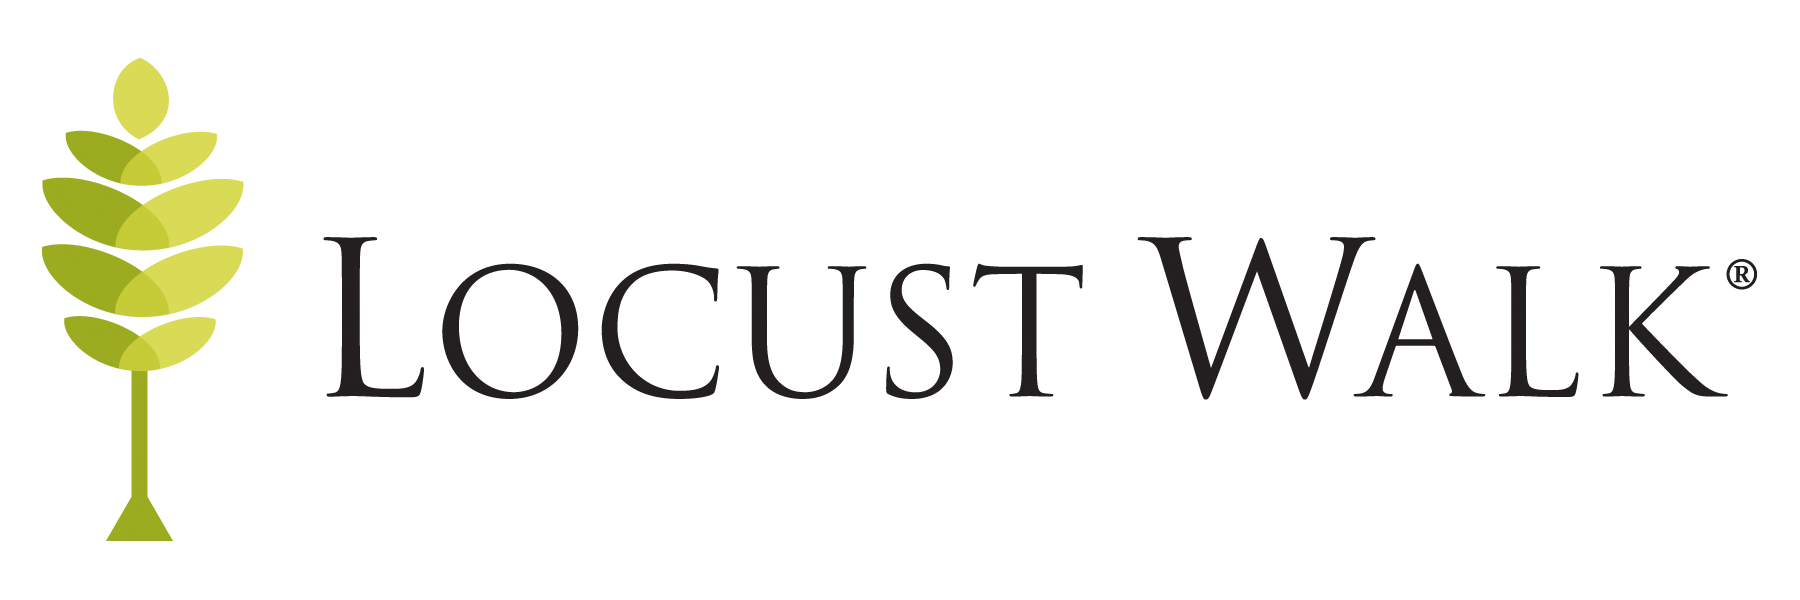 Locust Walk Japan, LLC